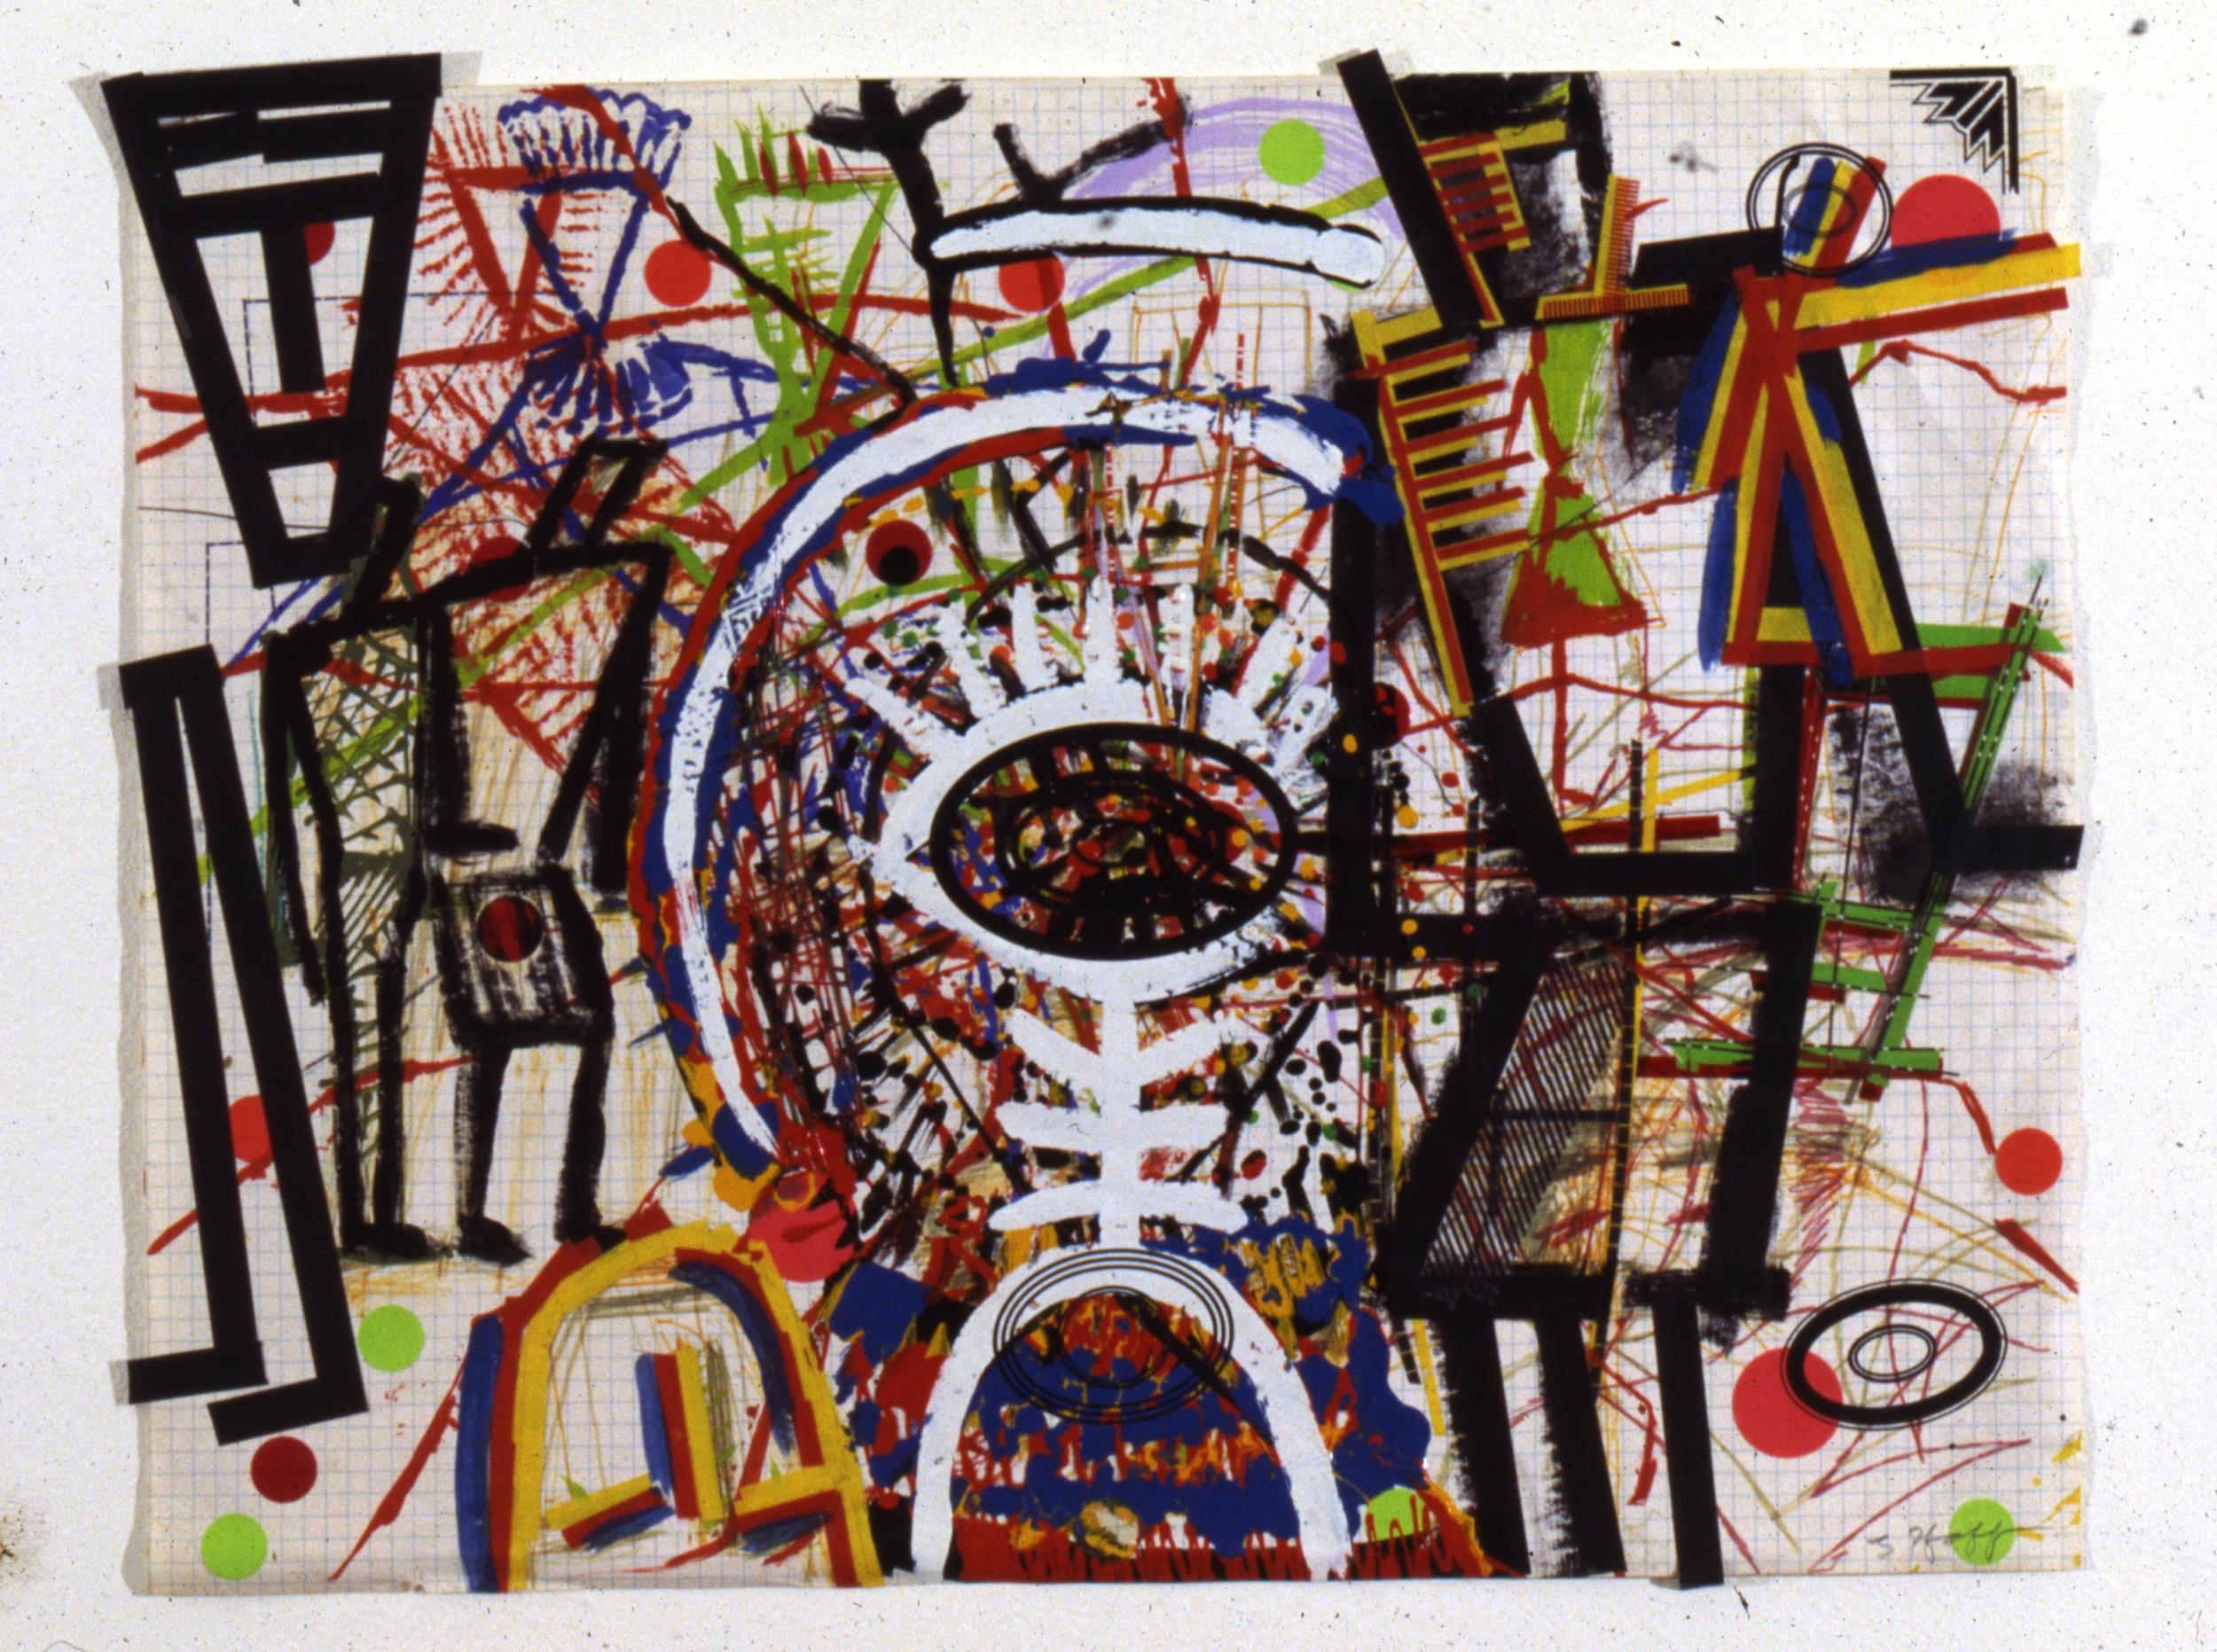 Untitled, 1978-1984